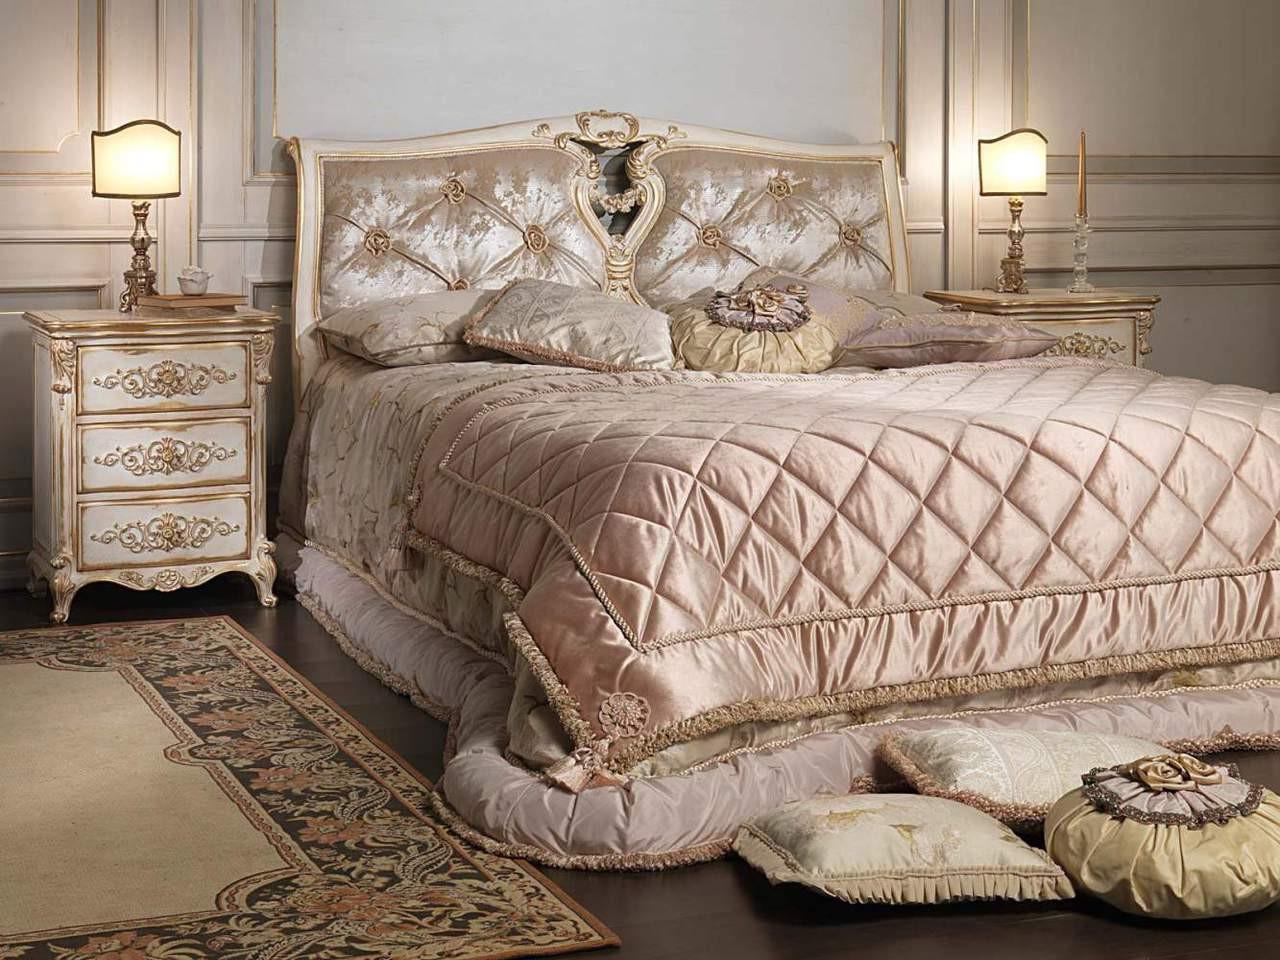 French Bedroom Furniture, Louis XVI Bed, designer bed